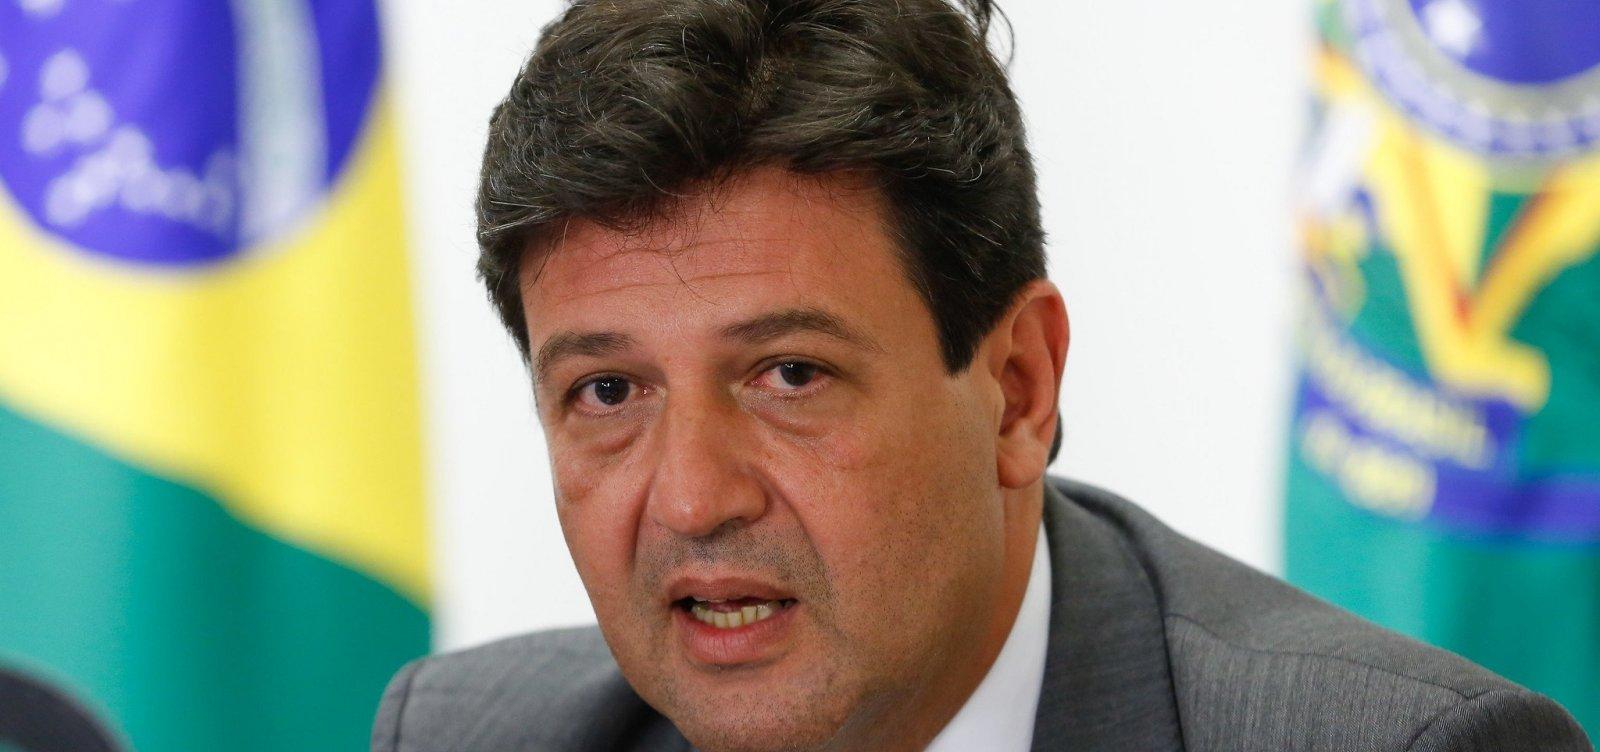 Após DEM se aproximar de Bolsonaro, Mandetta avalia deixar sigla